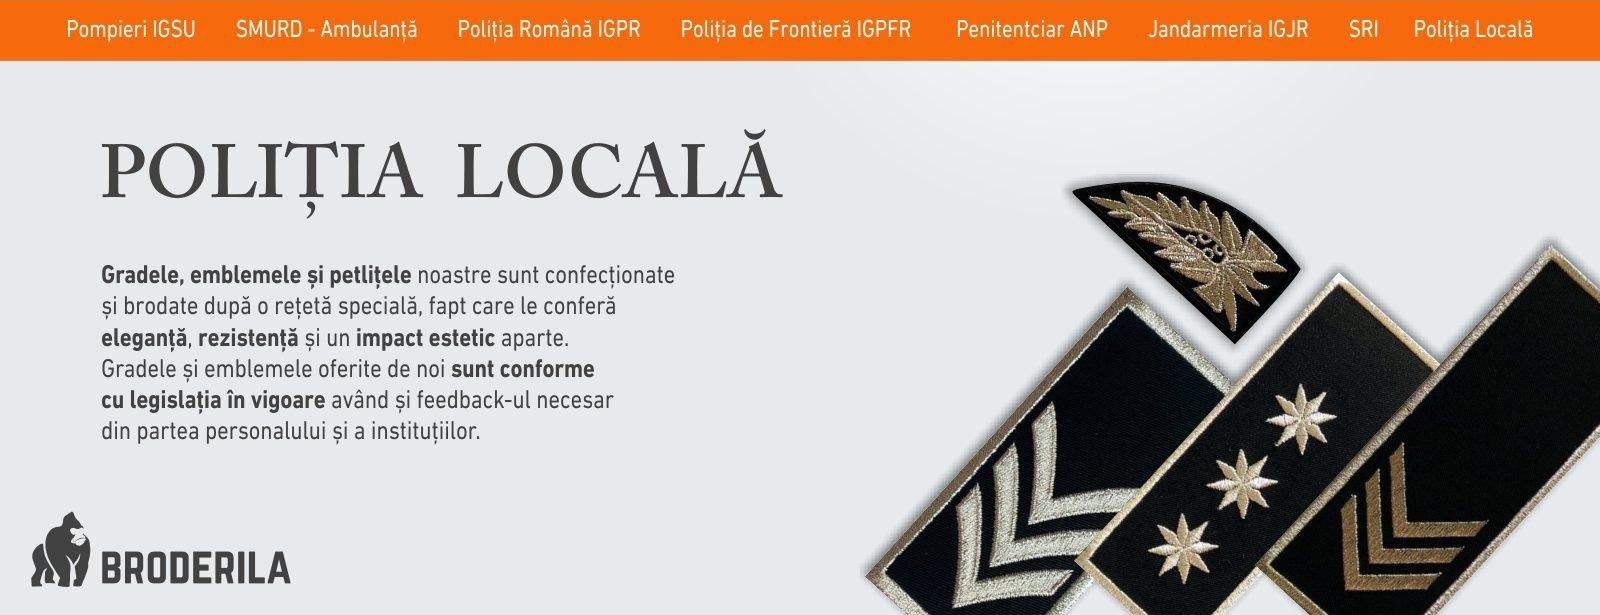 emblema brodata politia locala grade politia locala petlite politia locala emblema coifura politia locala sigla politia locala